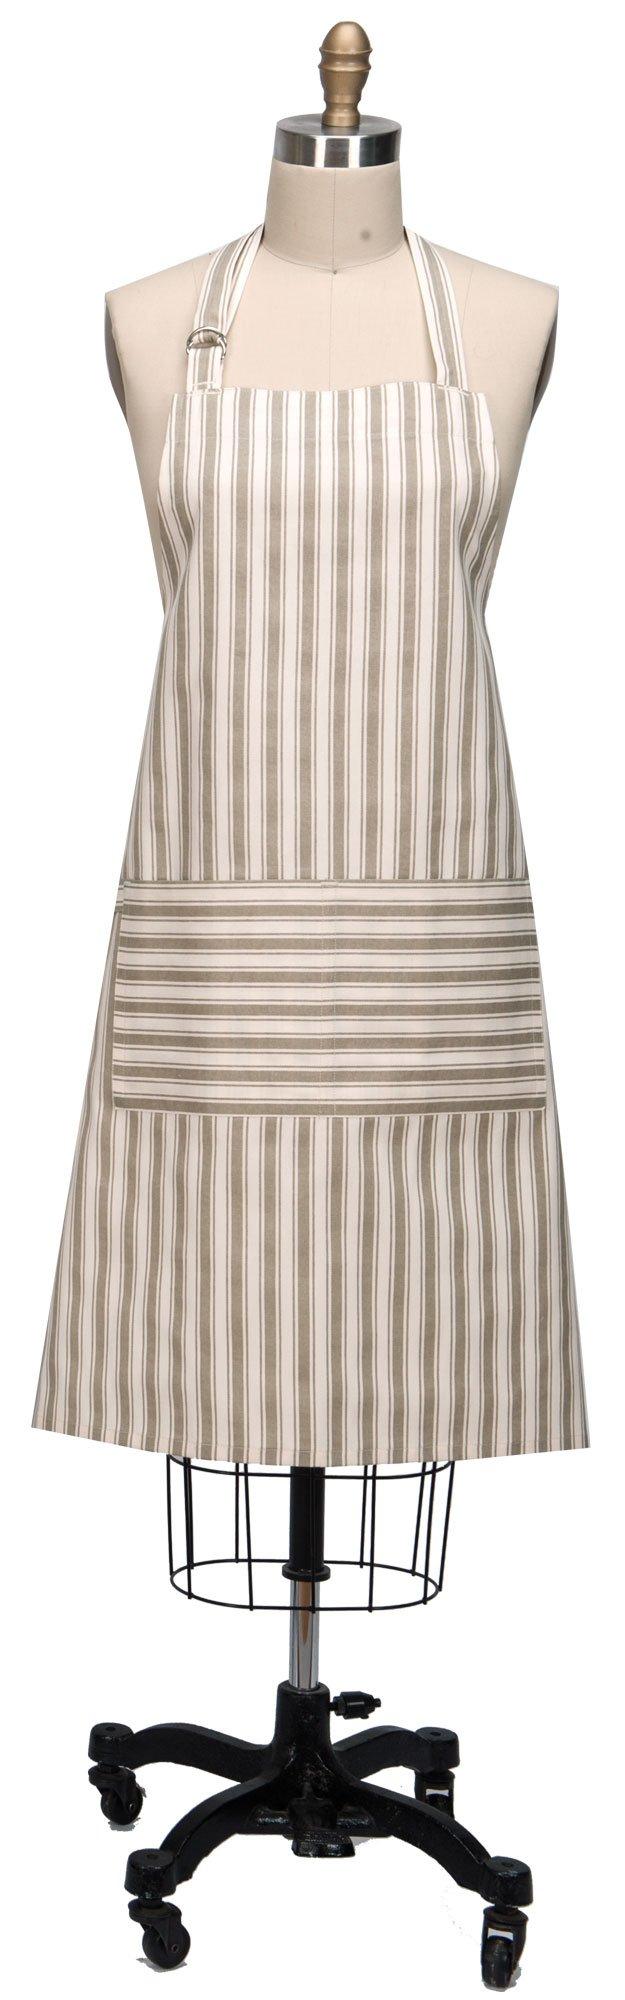 Kay Dee Designs R9291 Everyday Basics Chef Apron, Oxford Tan